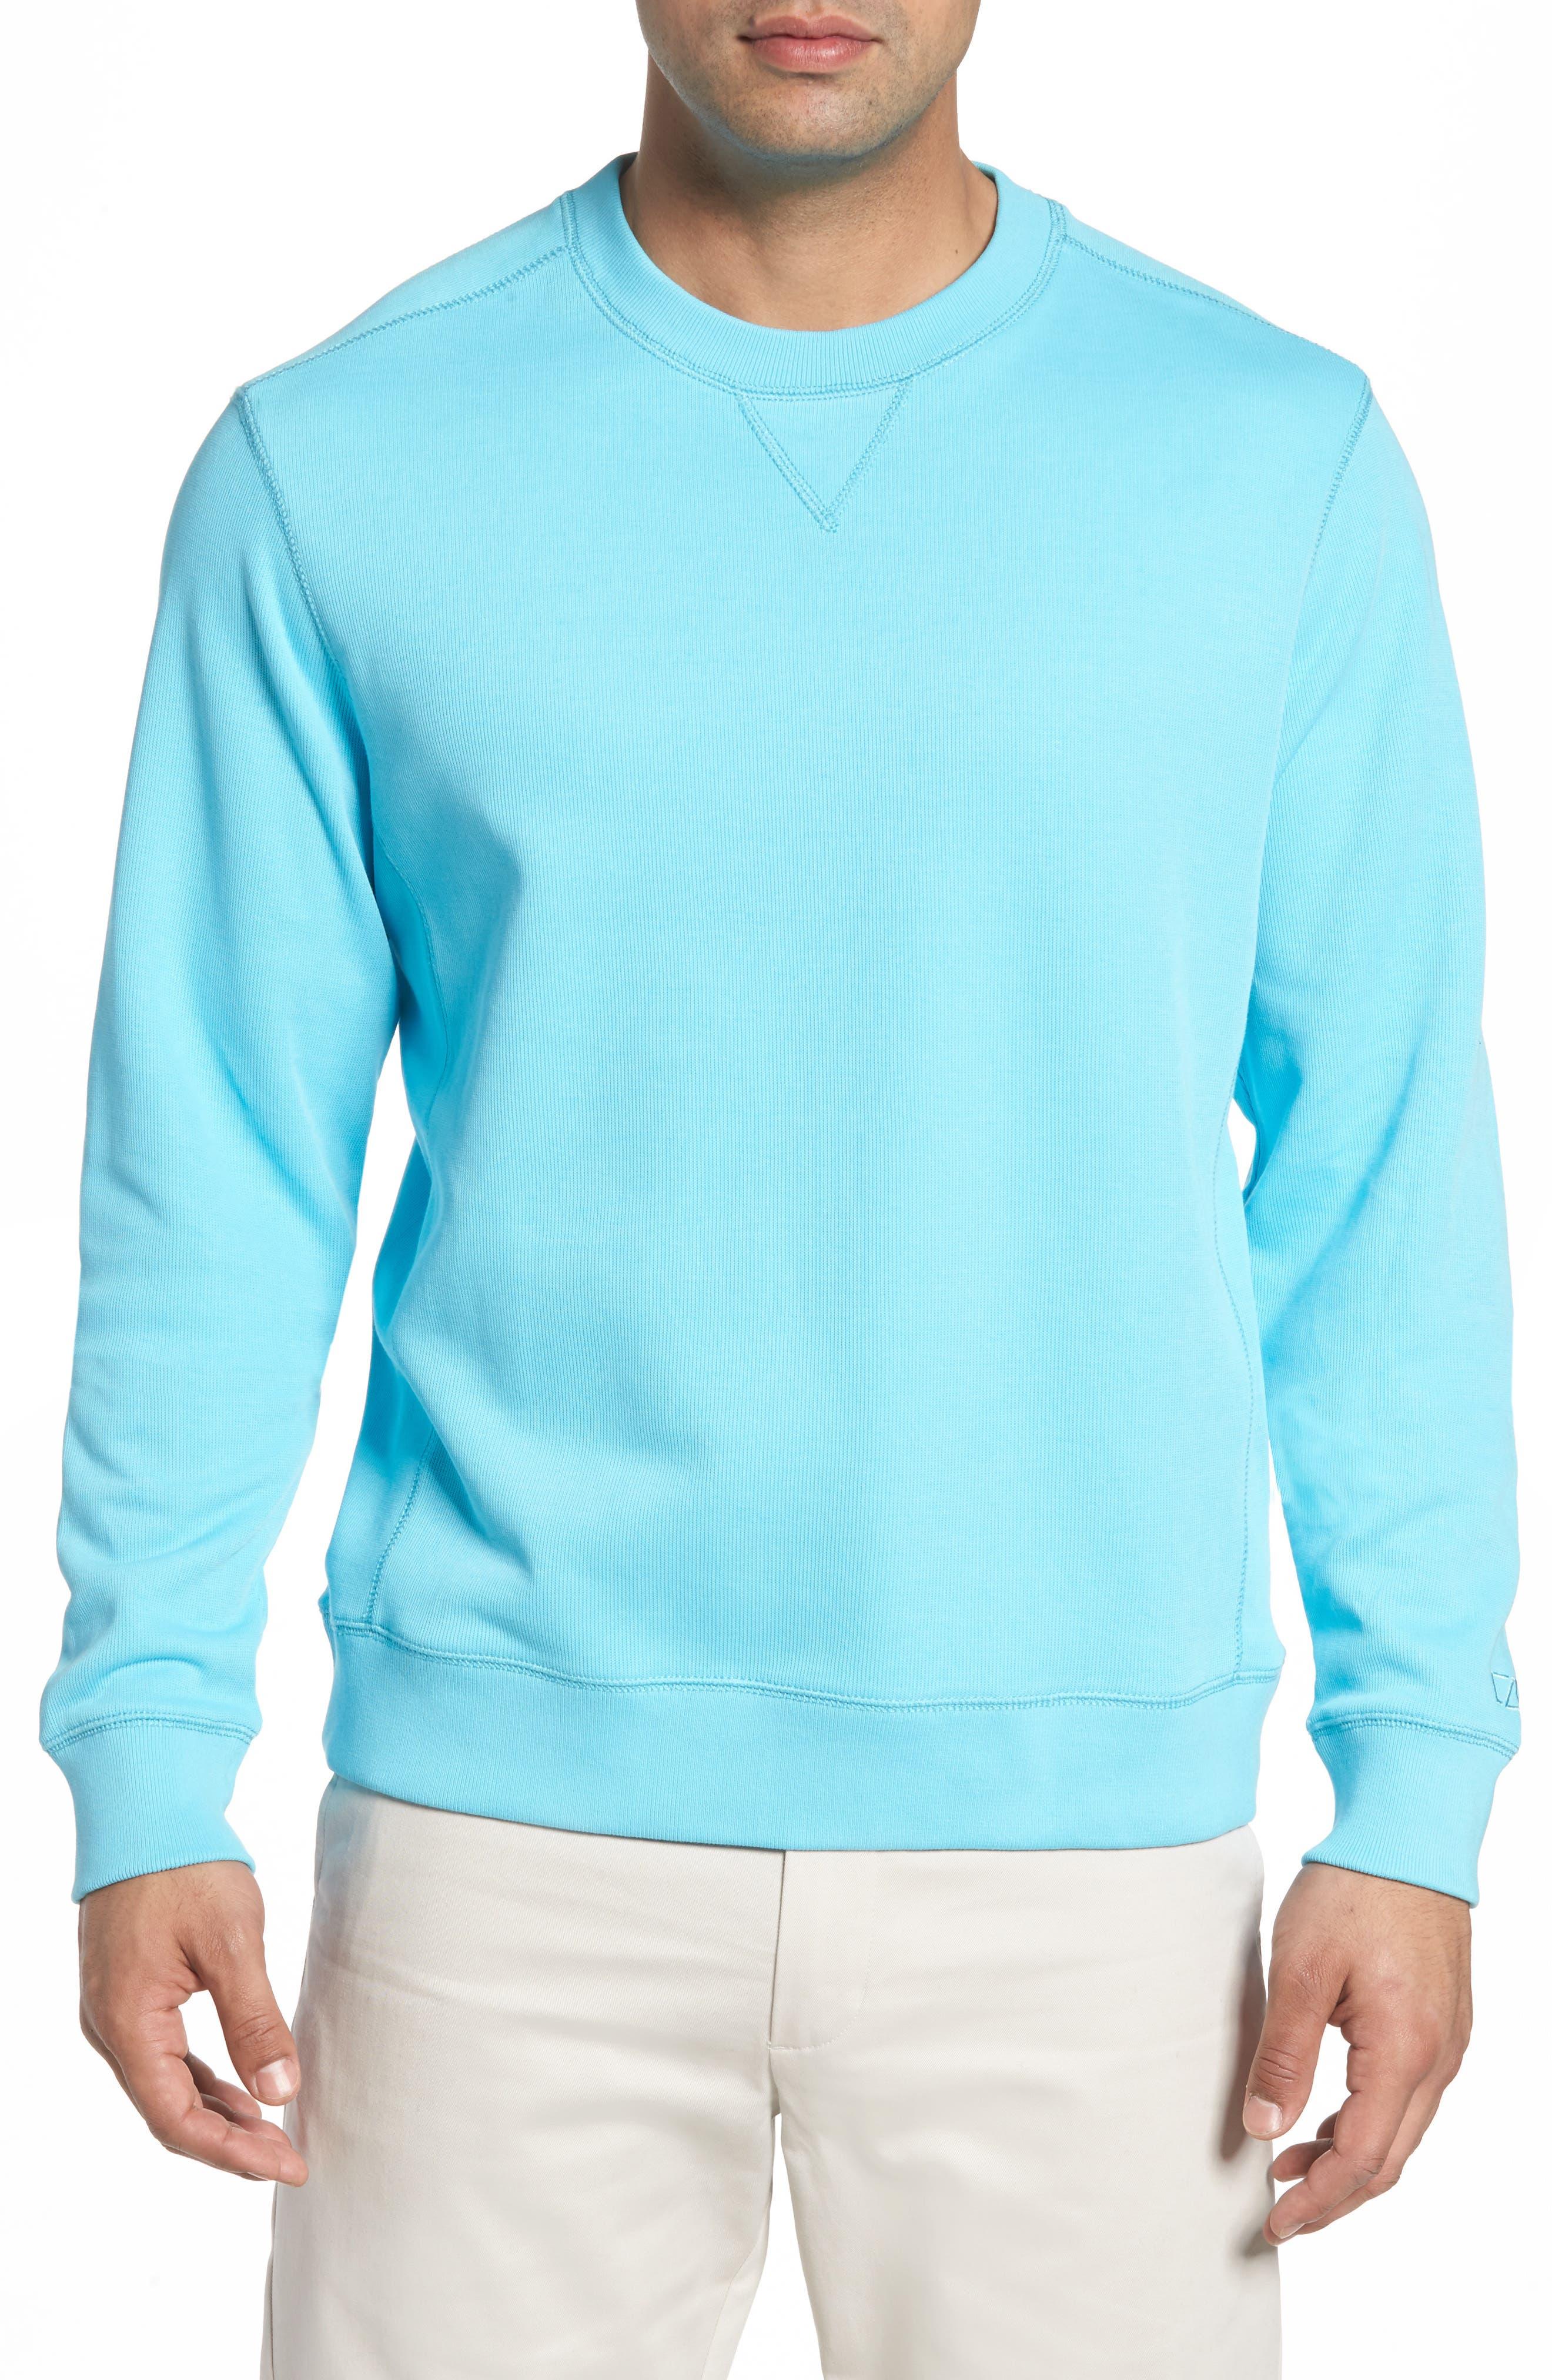 Bayview Crewneck Sweatshirt,                         Main,                         color, ARUBA